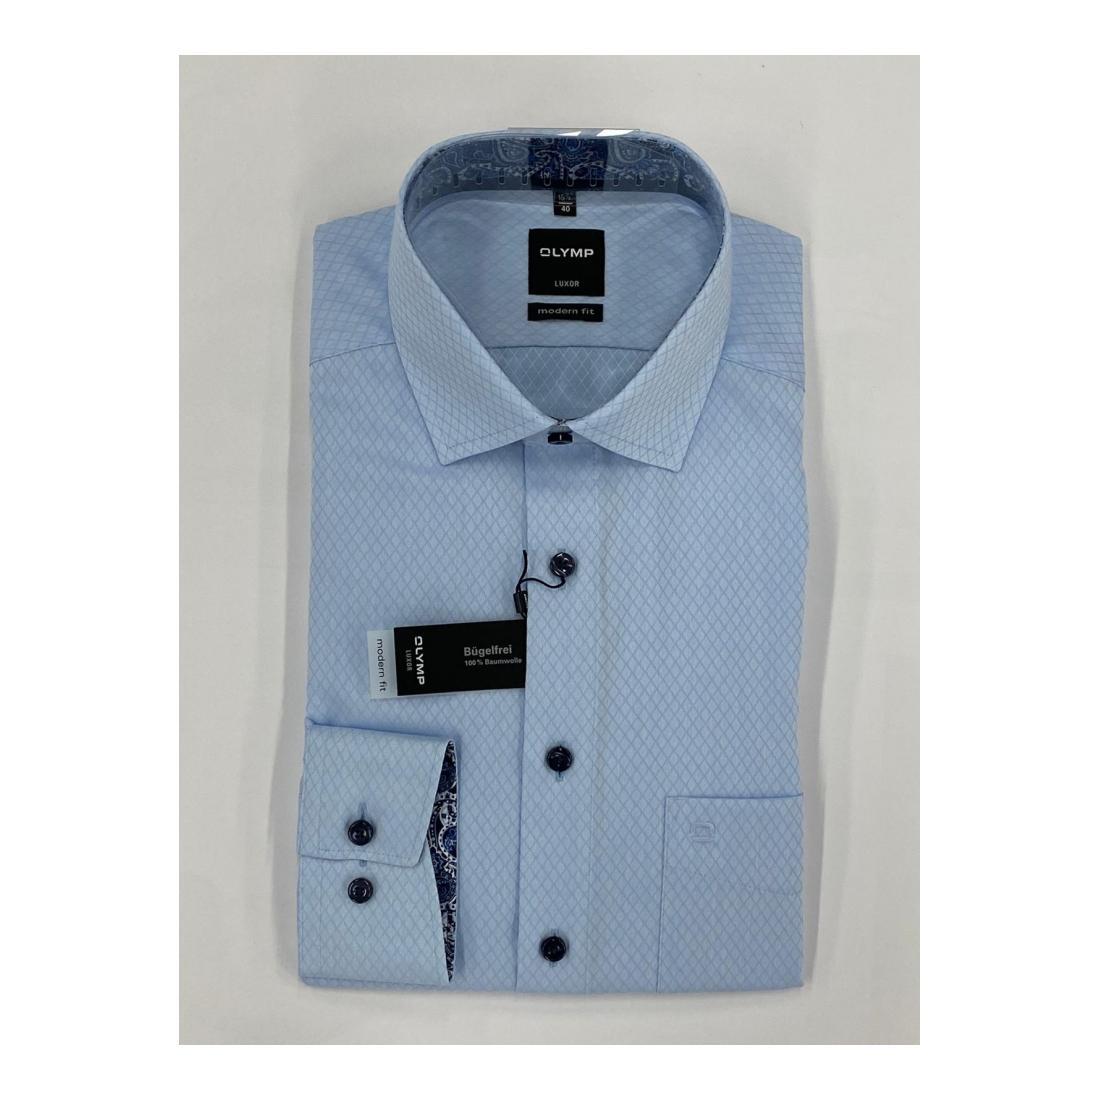 Olymp Business Hemden Herren 1324/64 Hemden